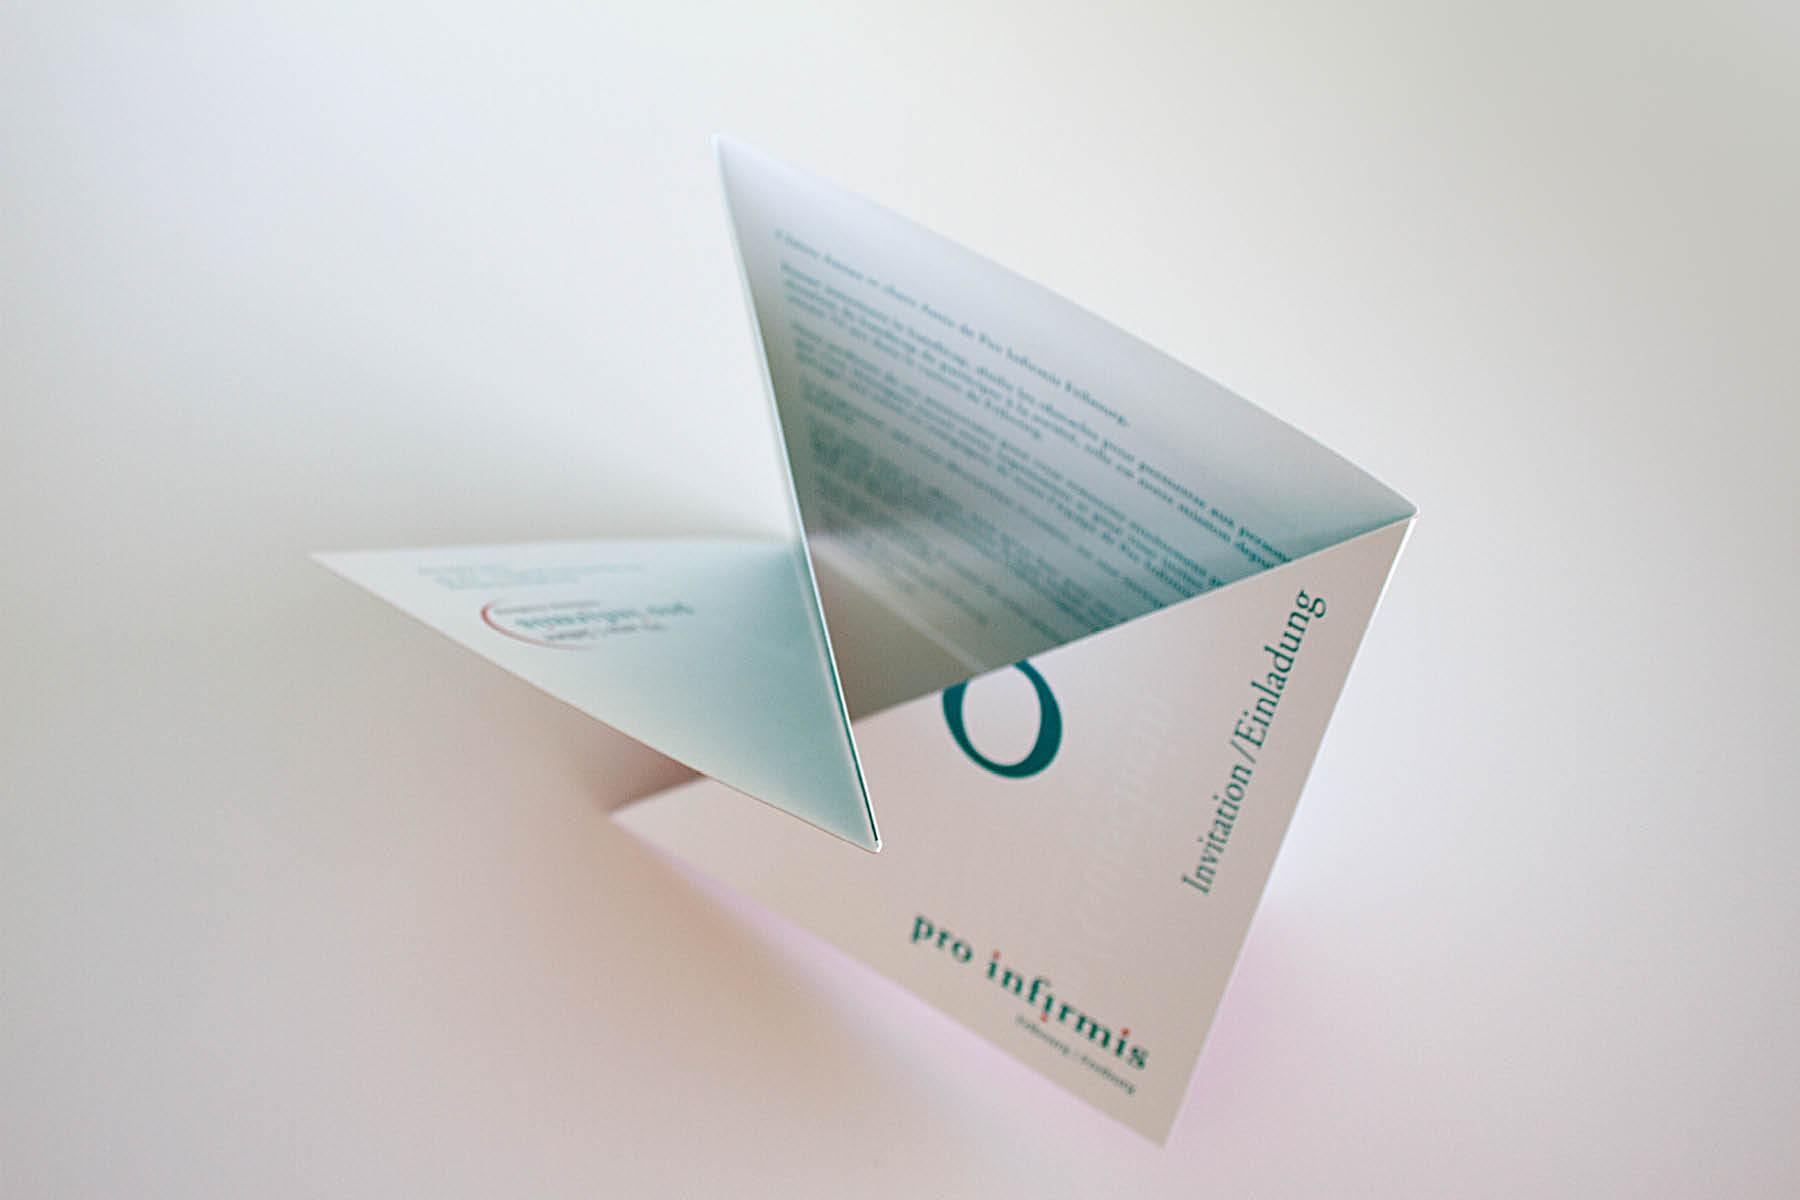 proinfirmis-invitation-graphisme